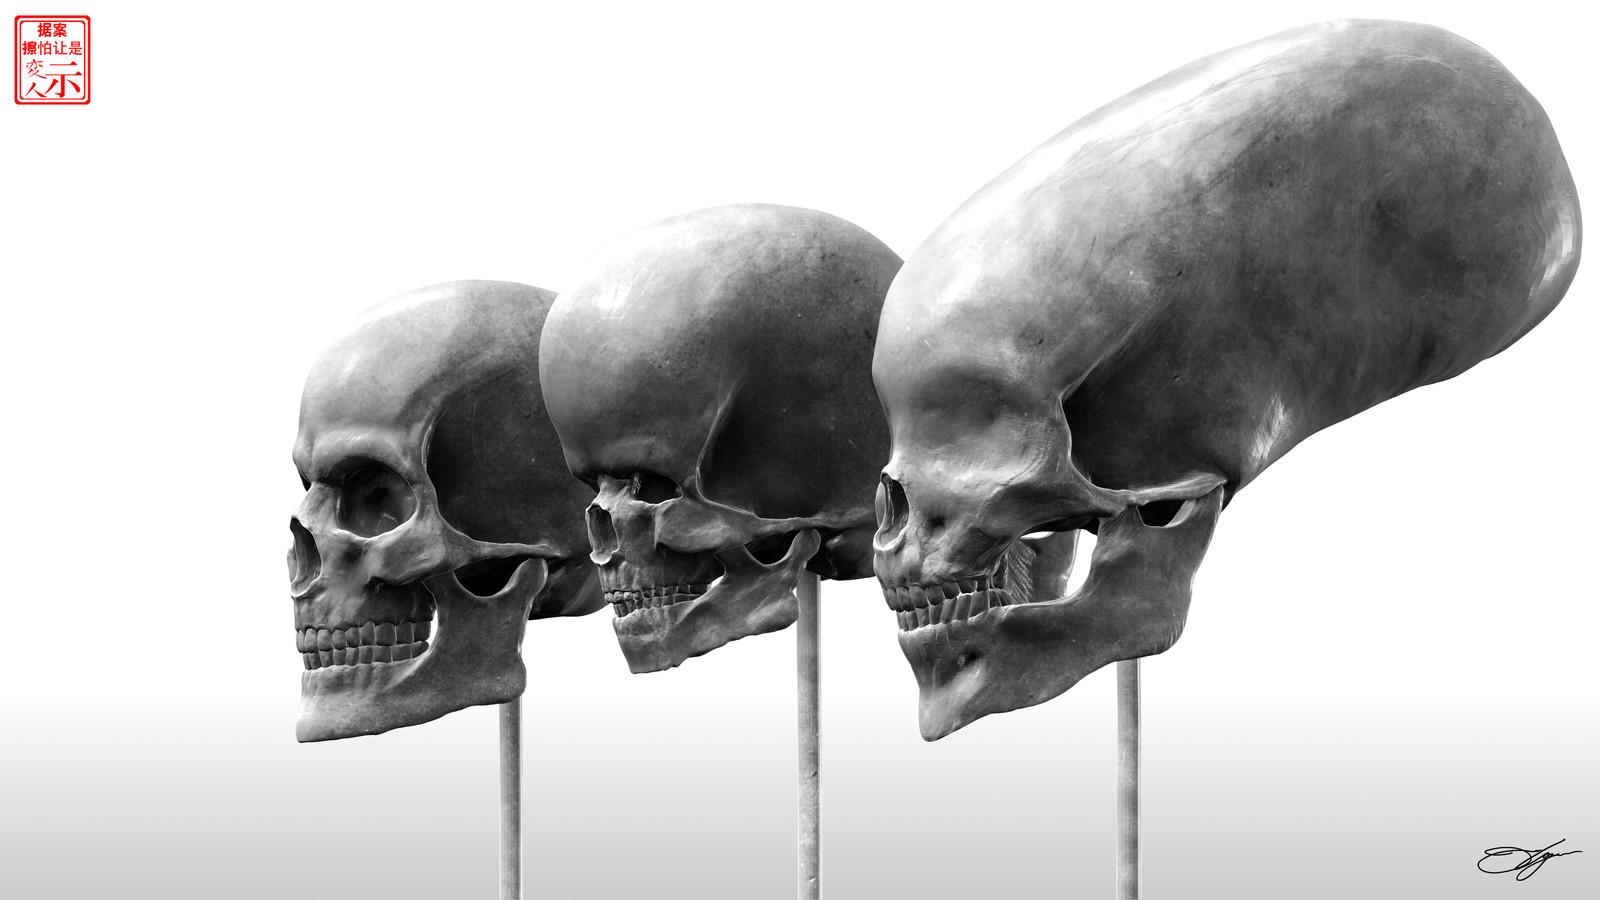 Human & Fictional Skull Study